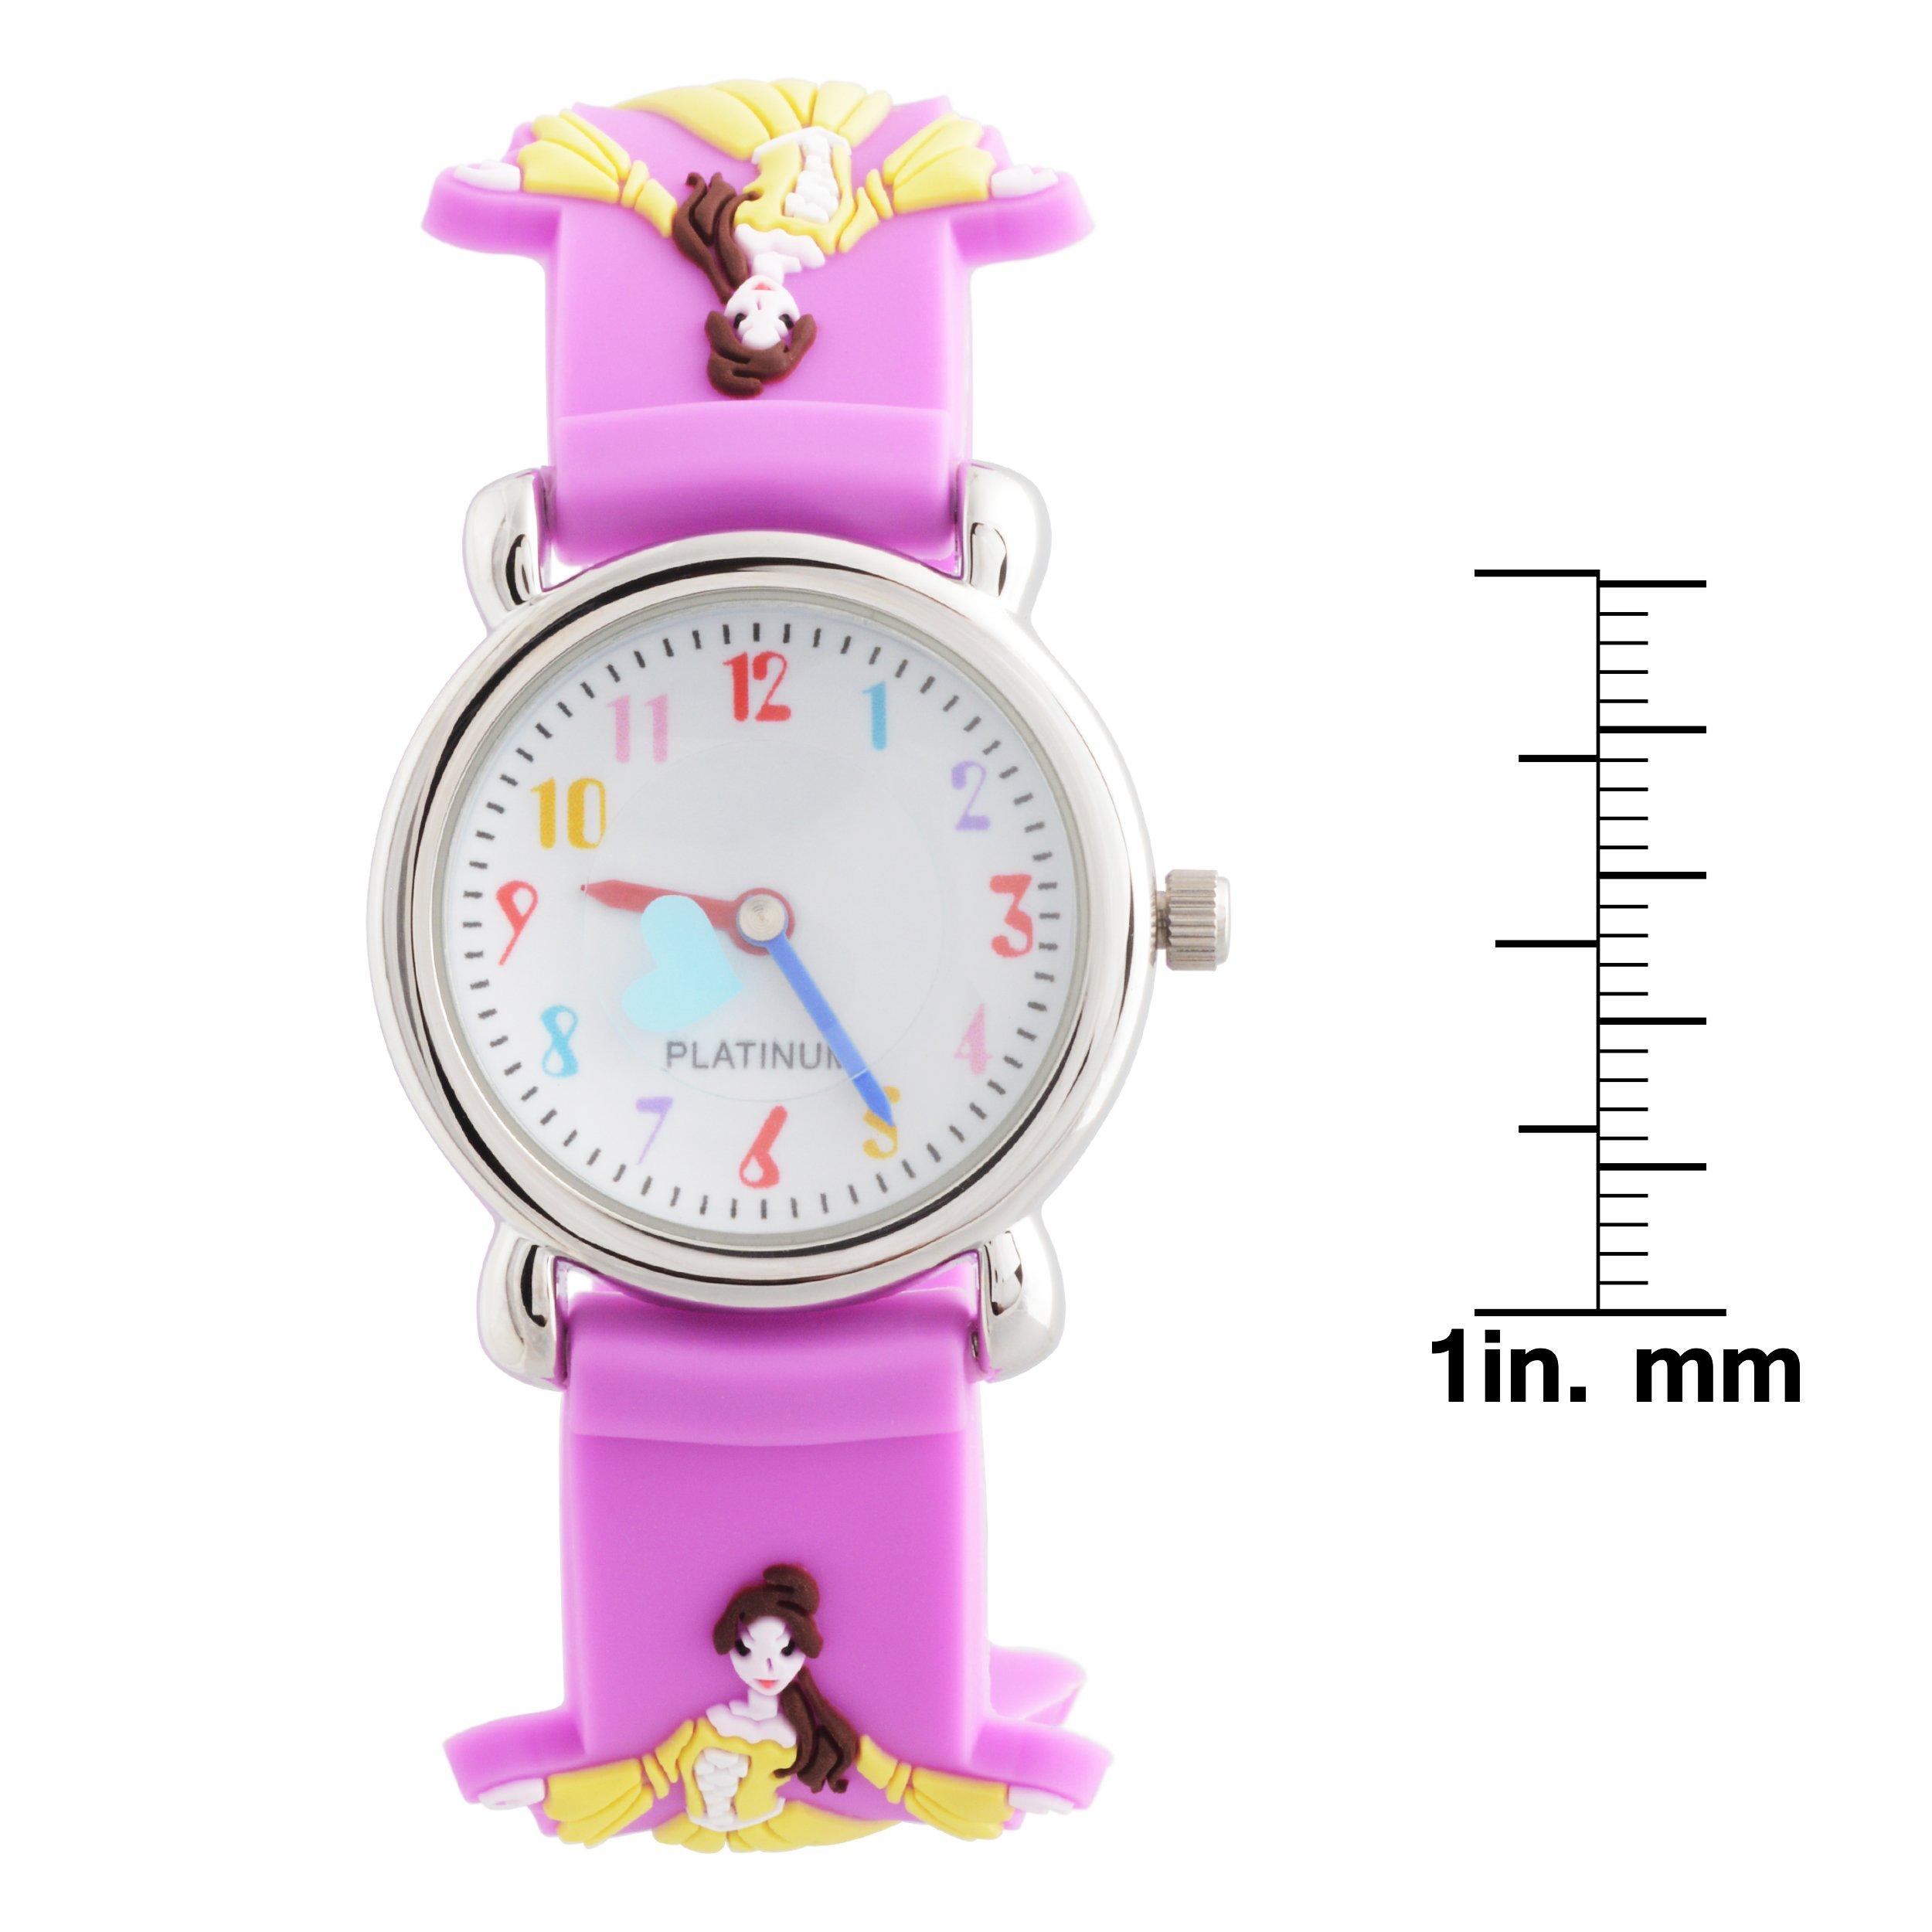 Brinley Co. Girls Princess Design Silicone Watch